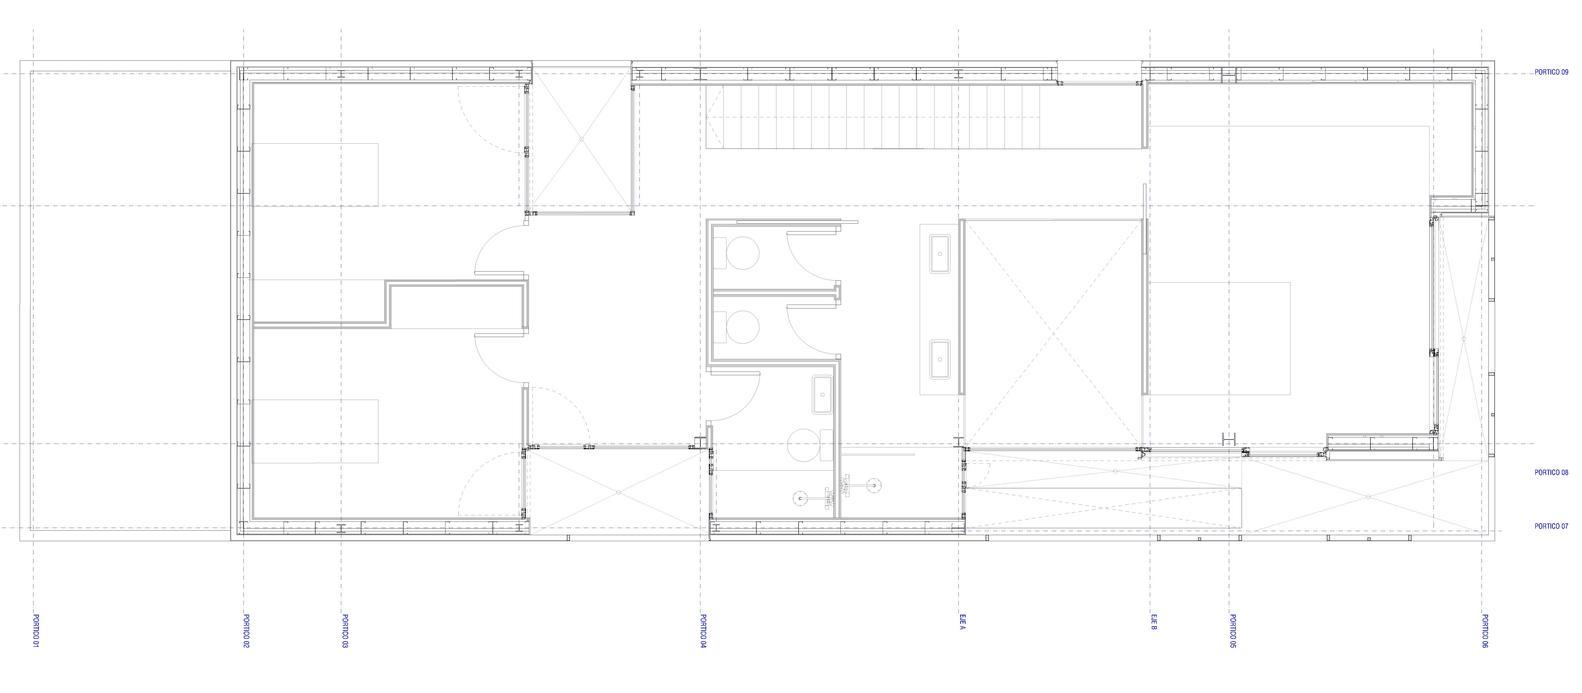 Bố trí mặt bằng lầu 1 - Castelldefels House